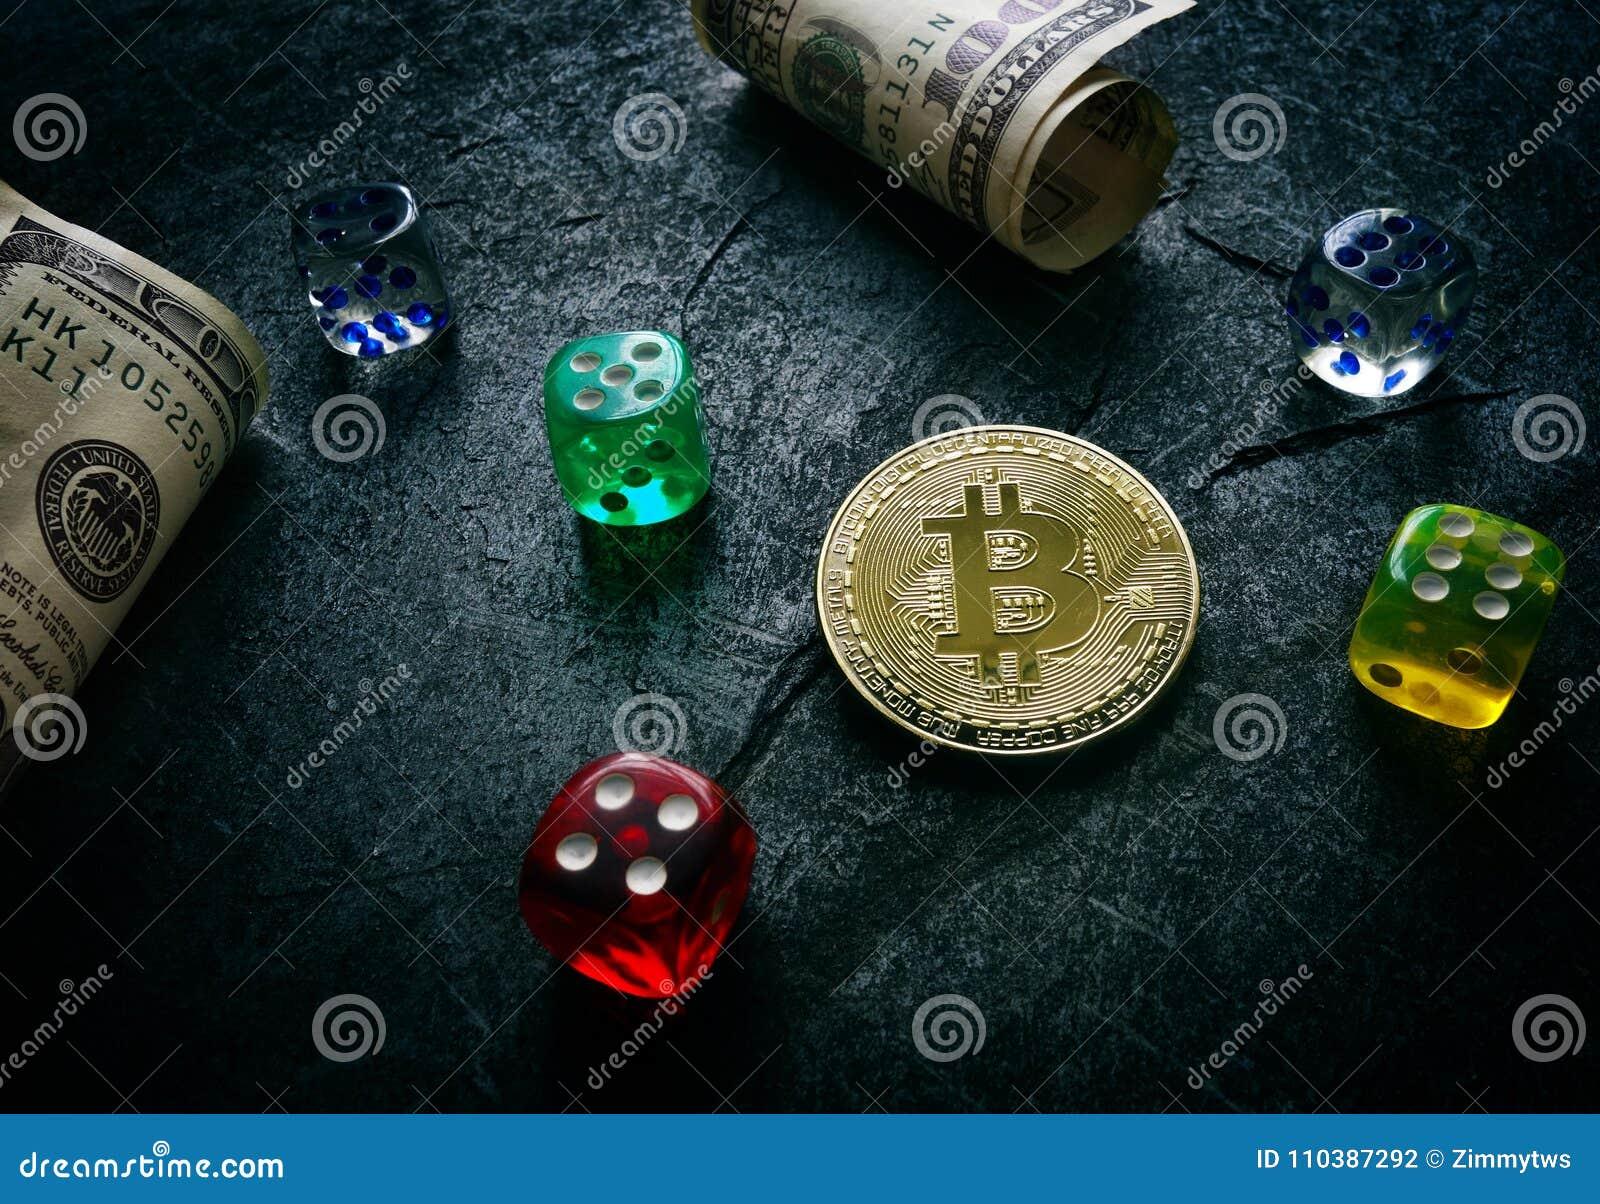 Bitcoin dice and money stock photo  Image of gamble - 110387292